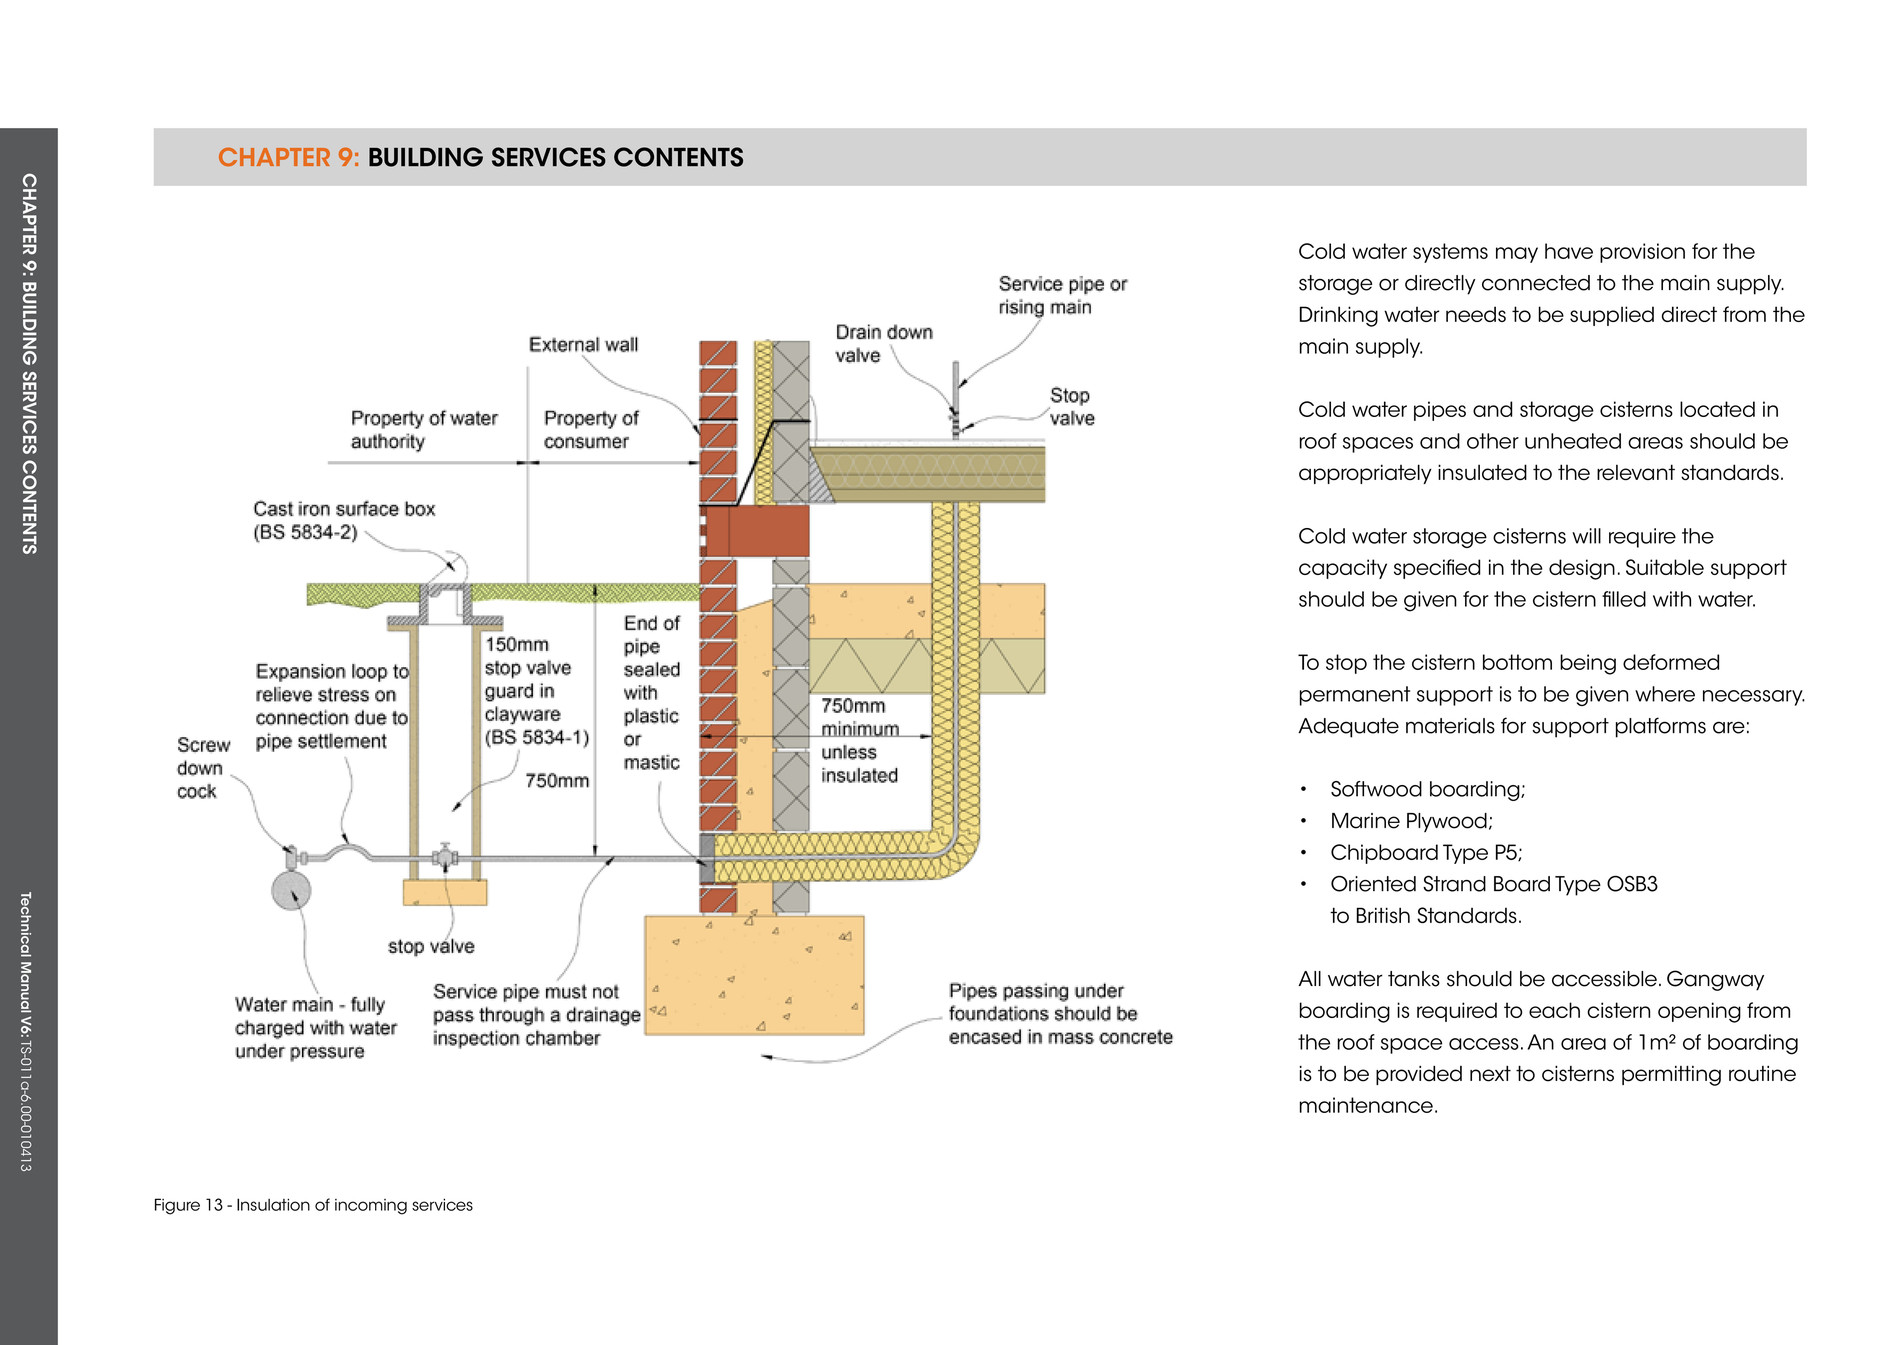 LABC Warranty - LABC Warranty Technical Manual - Page 278-279